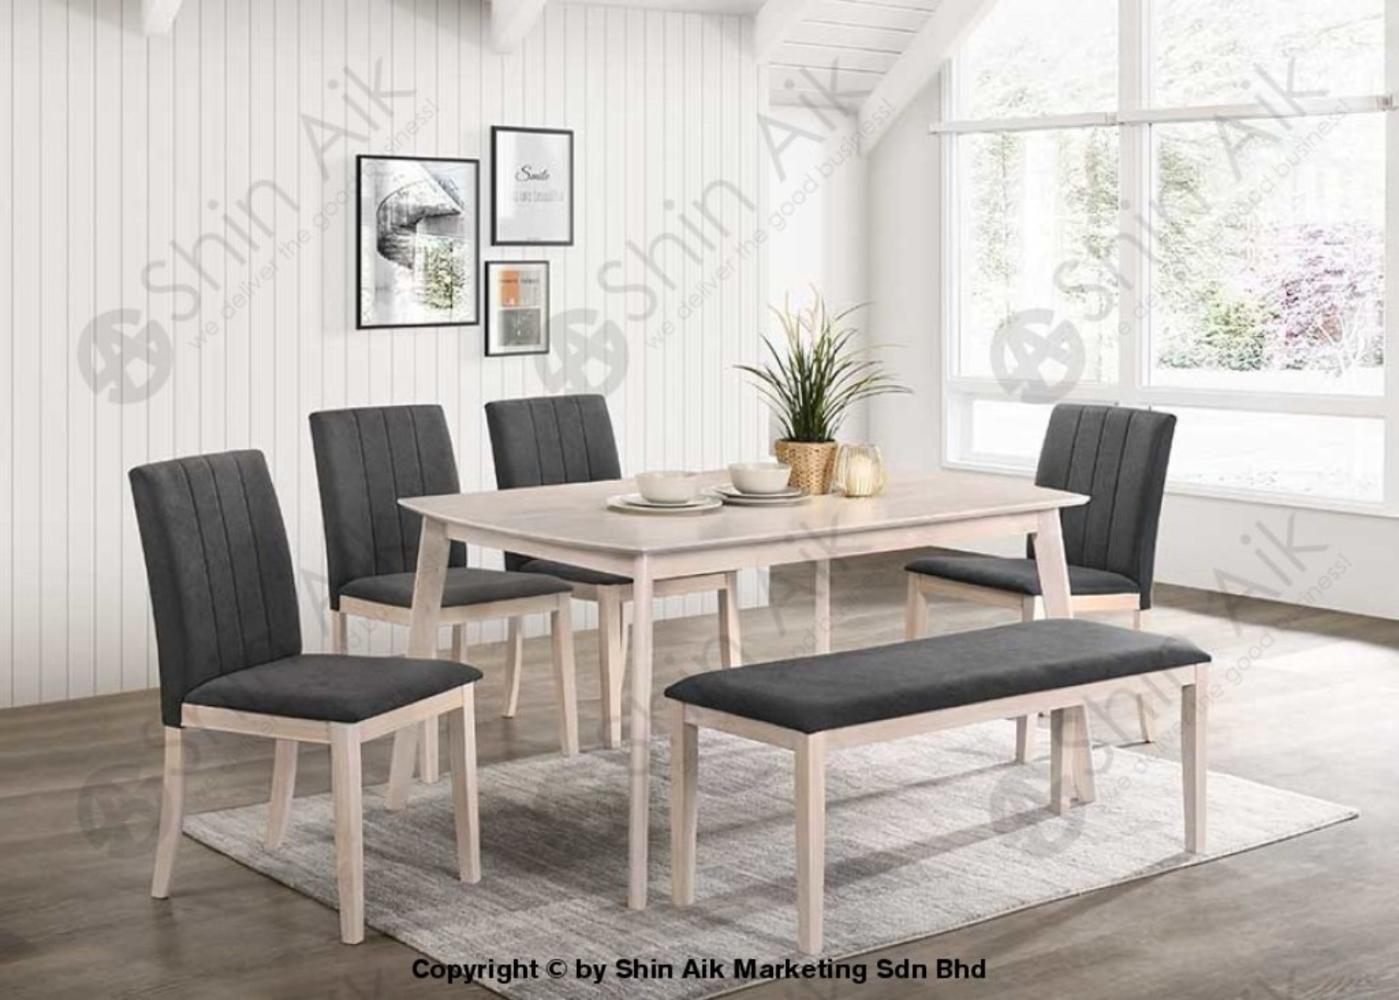 Grey & Whitewash Mid-Century Fabric Upholstered Wooden Dining Set (6pax) - SADC2213